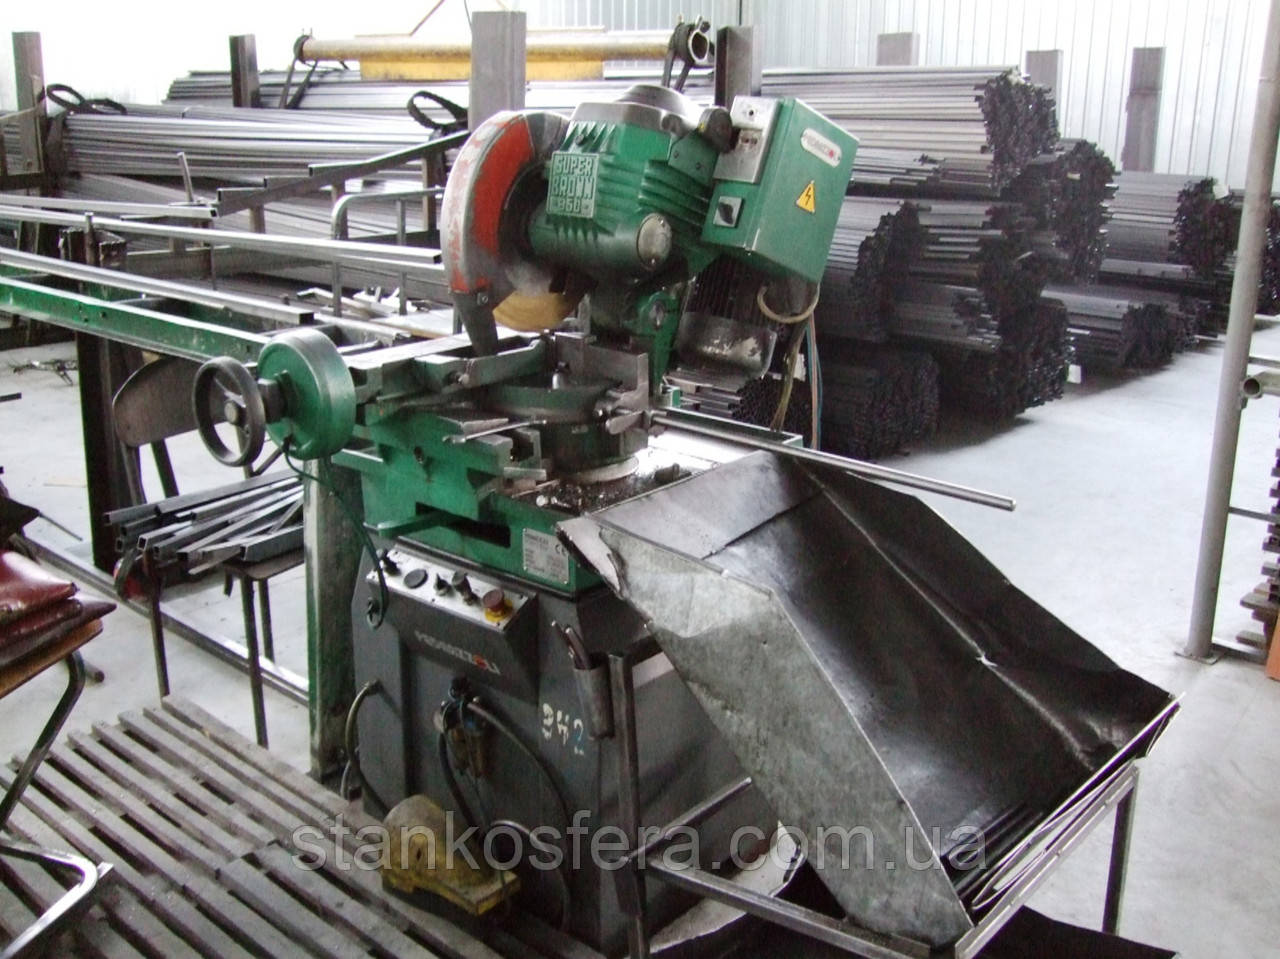 Отрезной станок бу для металлических труб и прута Pedrazzoli Super Brawn 350/60 SA (Италия), 2002 г.